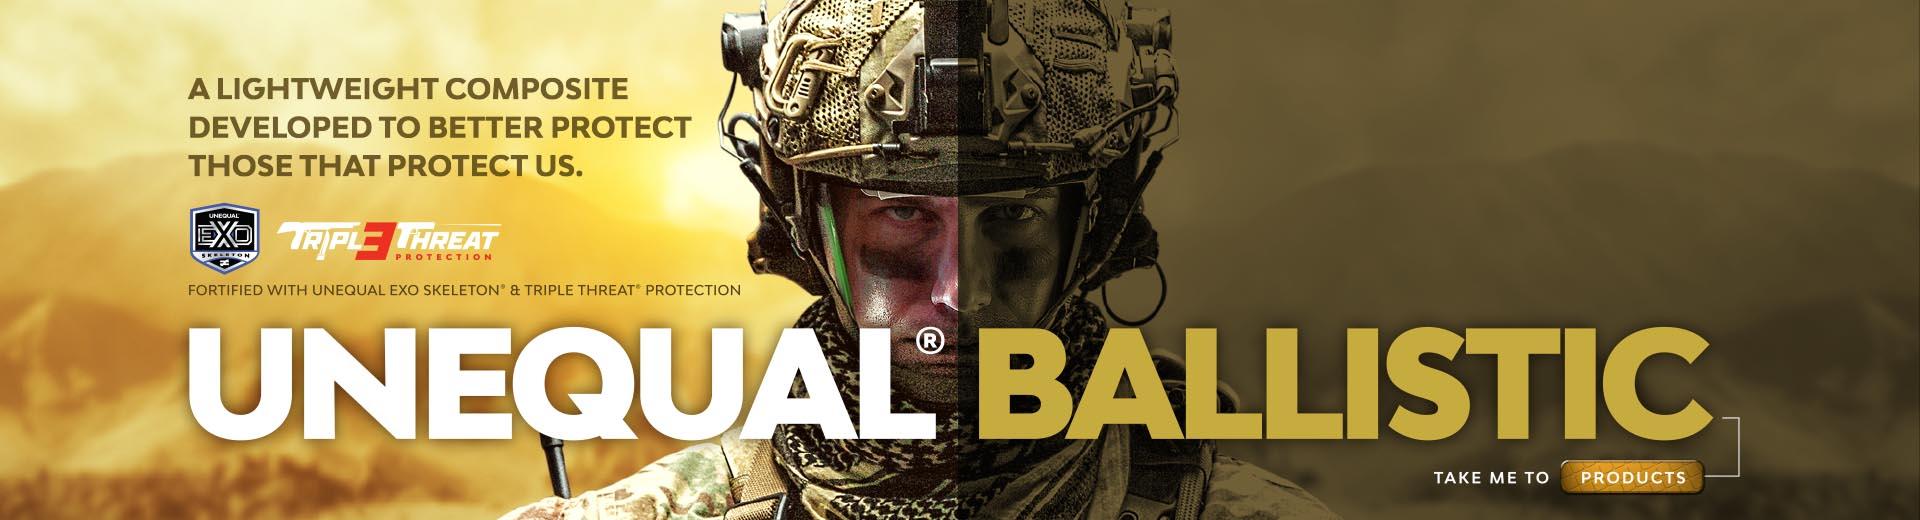 ballistic military grade vest